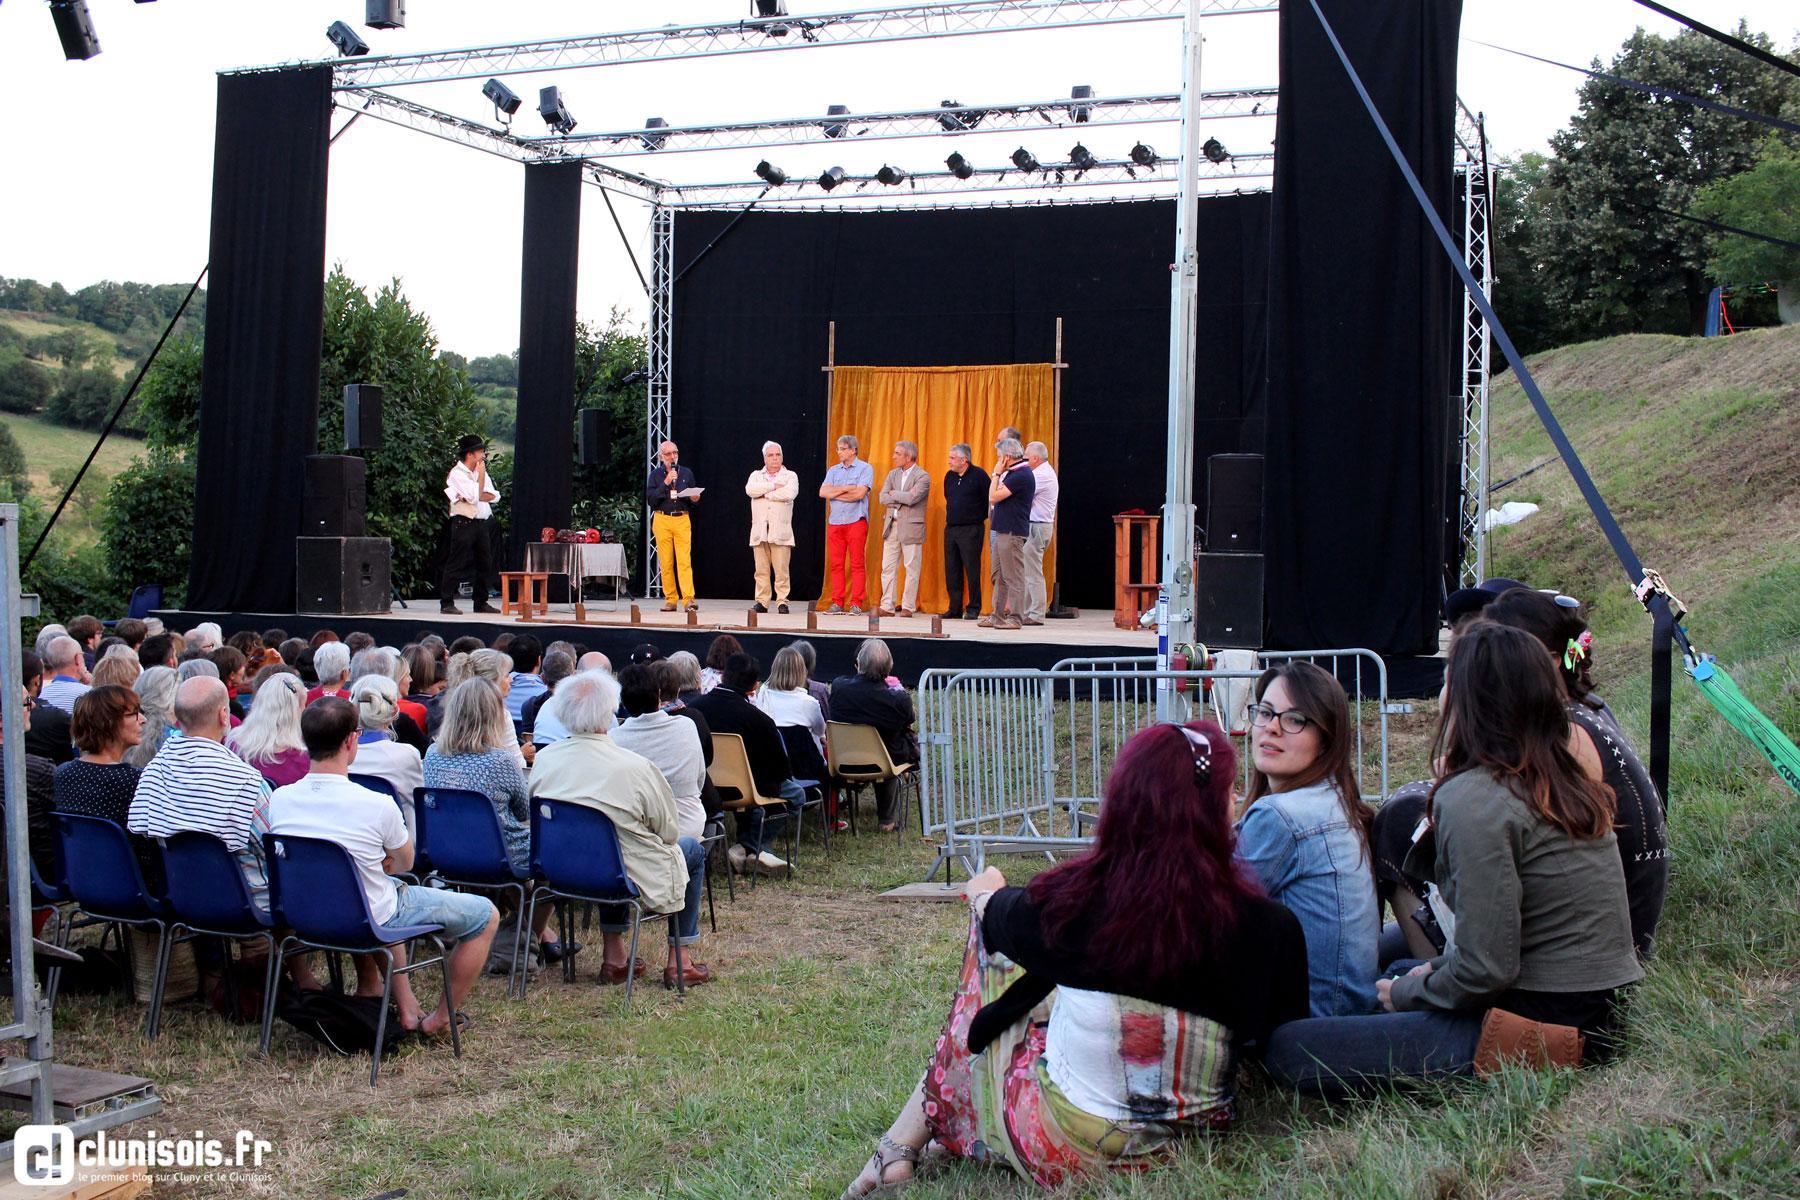 festival-lournand-2016-photo-clunisoisfr-01